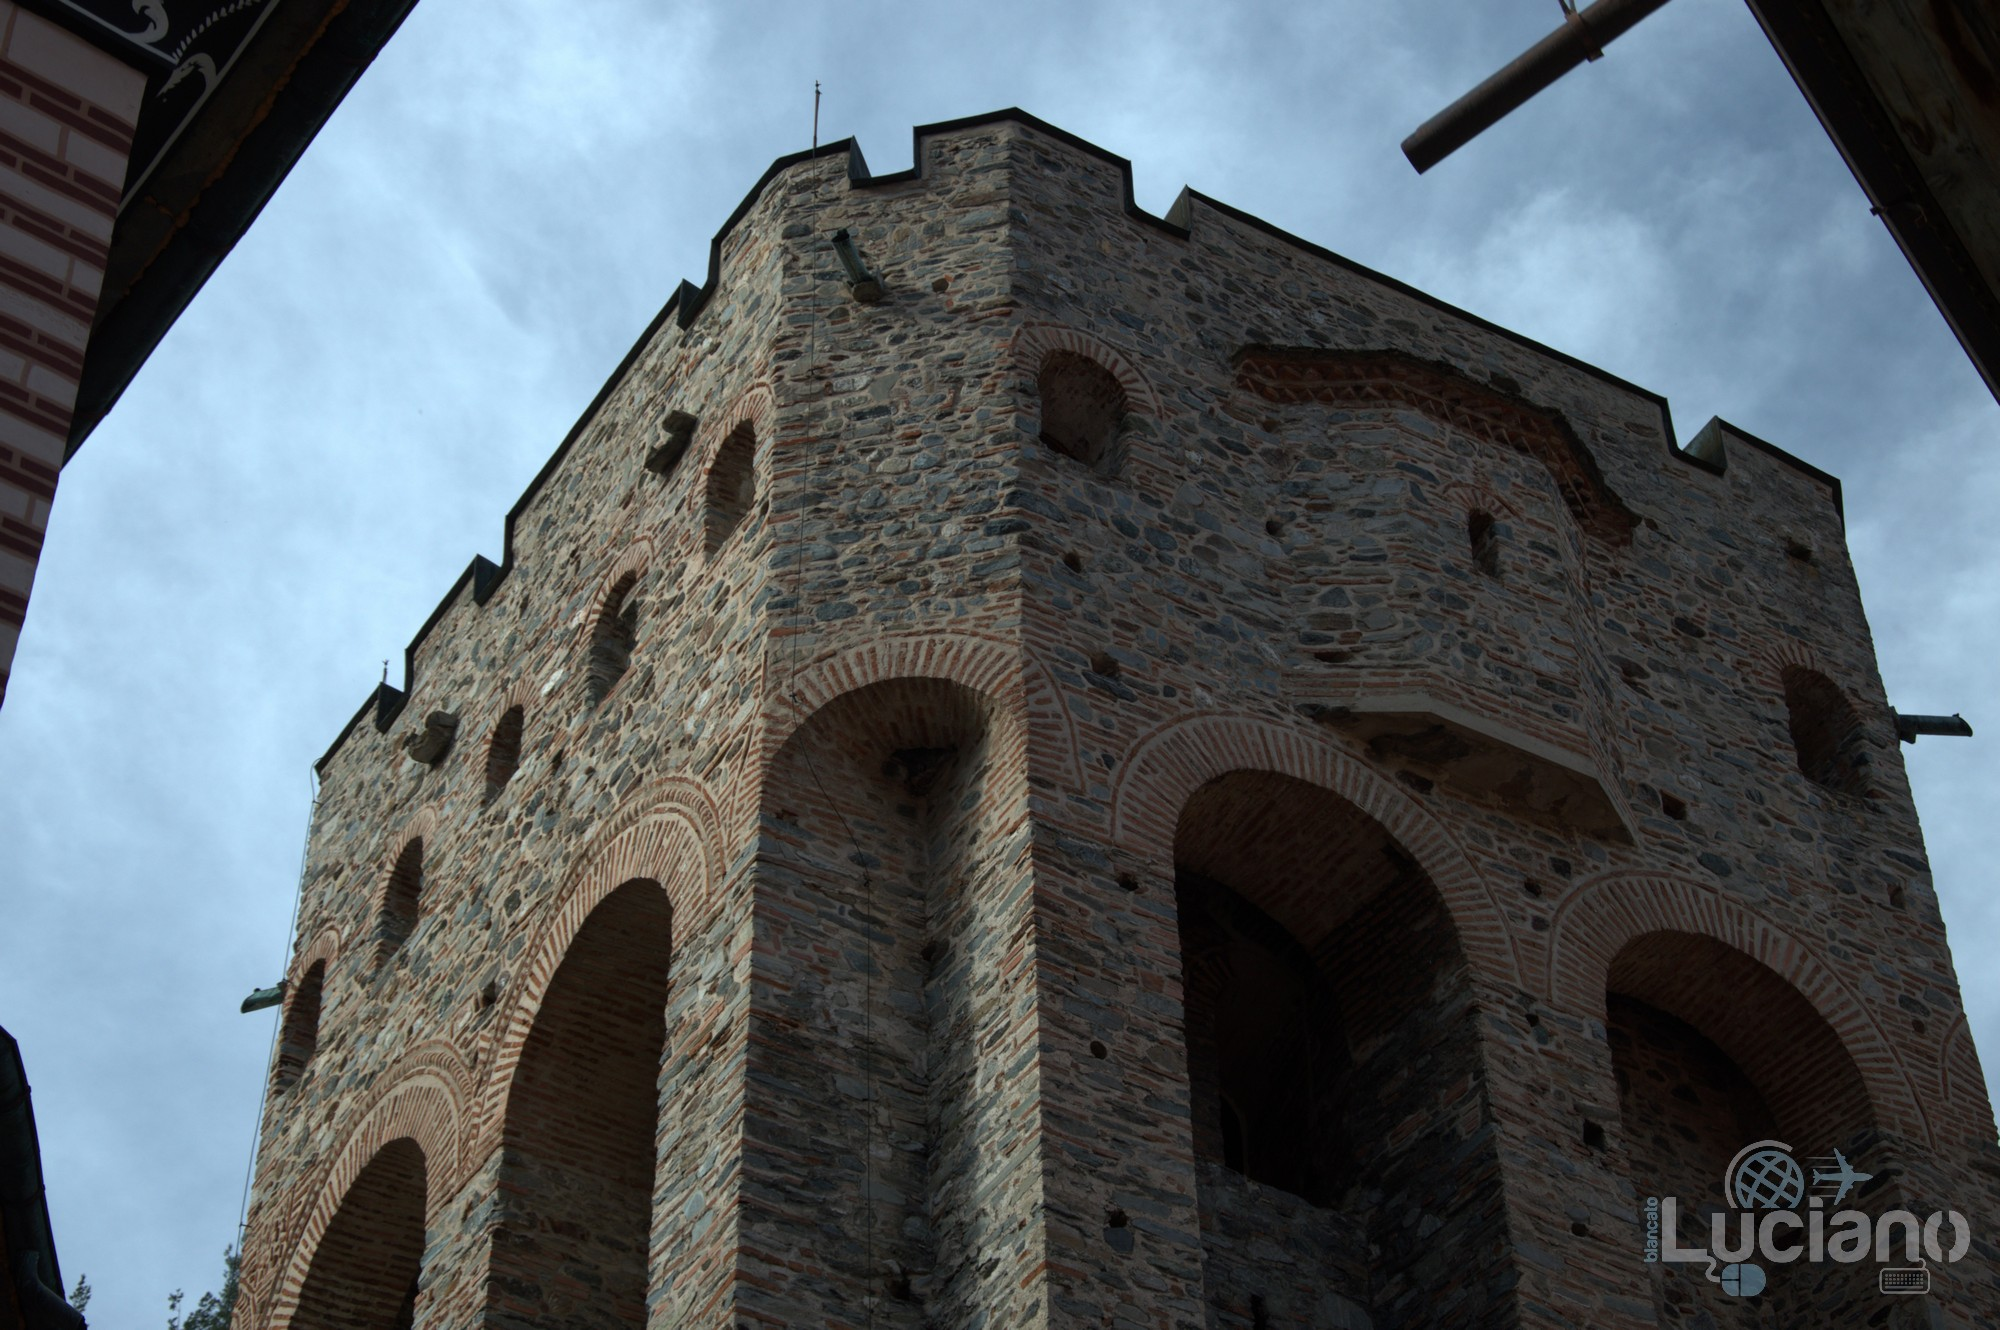 Vista interna - torre - Monastero di Rila, Рилски Манастир, Rilski Manastir - Sofia - Bulgaria